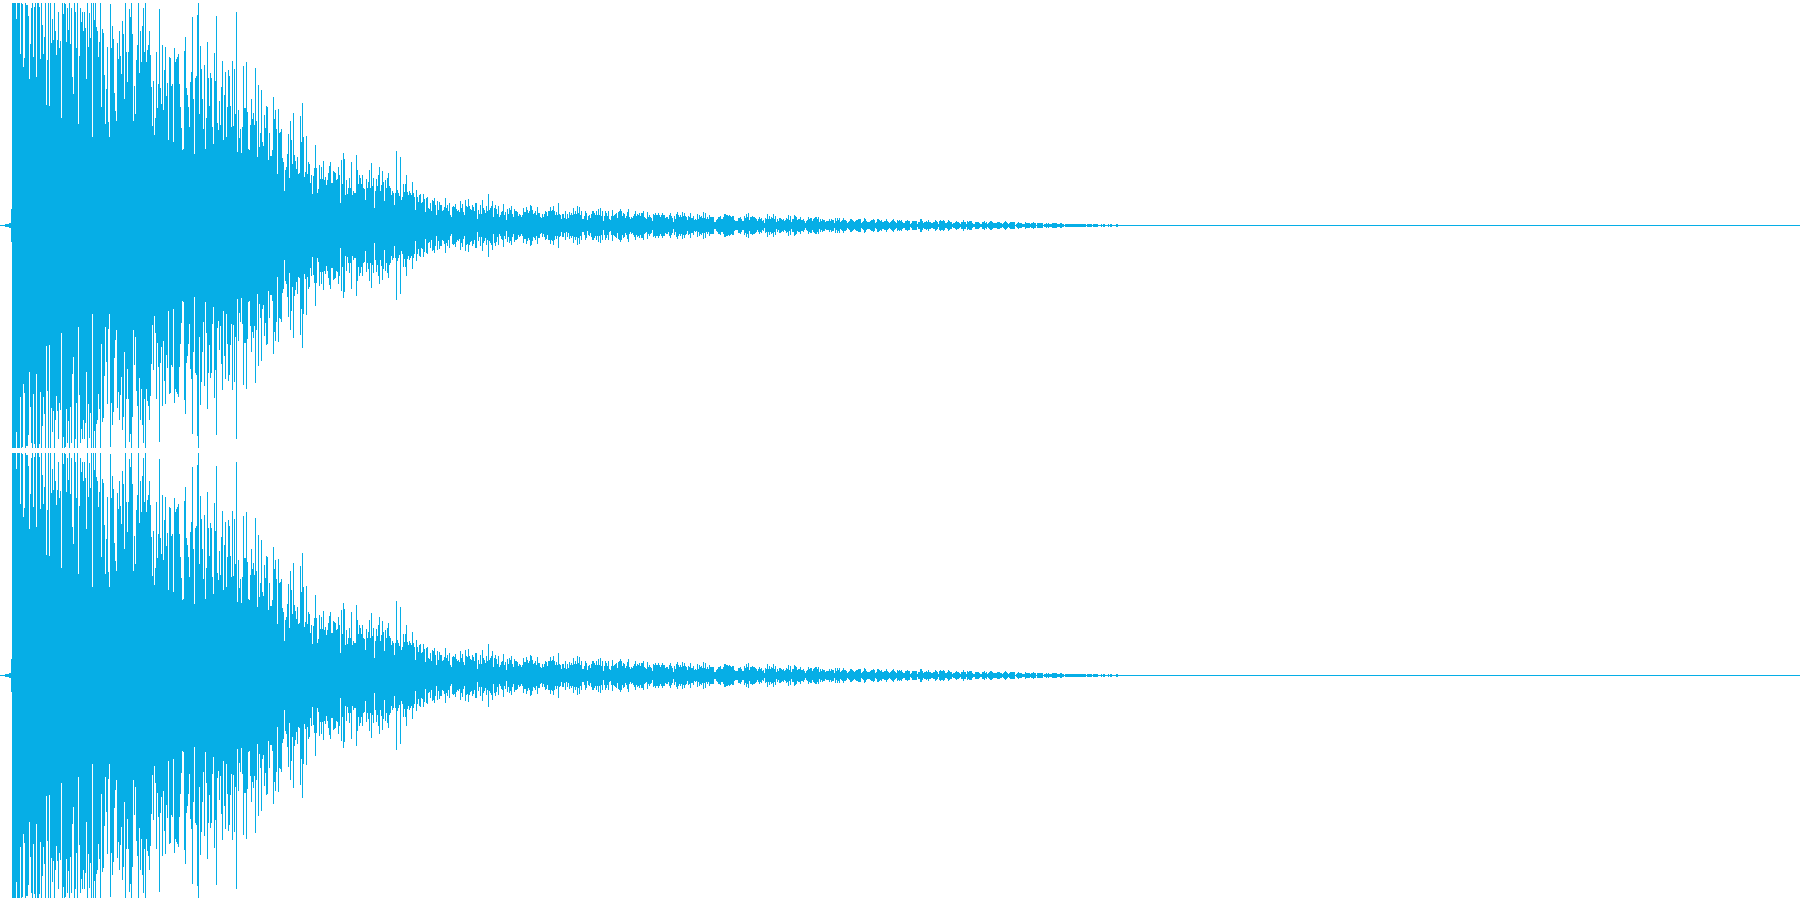 Katana 日本刀のしなやかな斬撃音の再生済みの波形